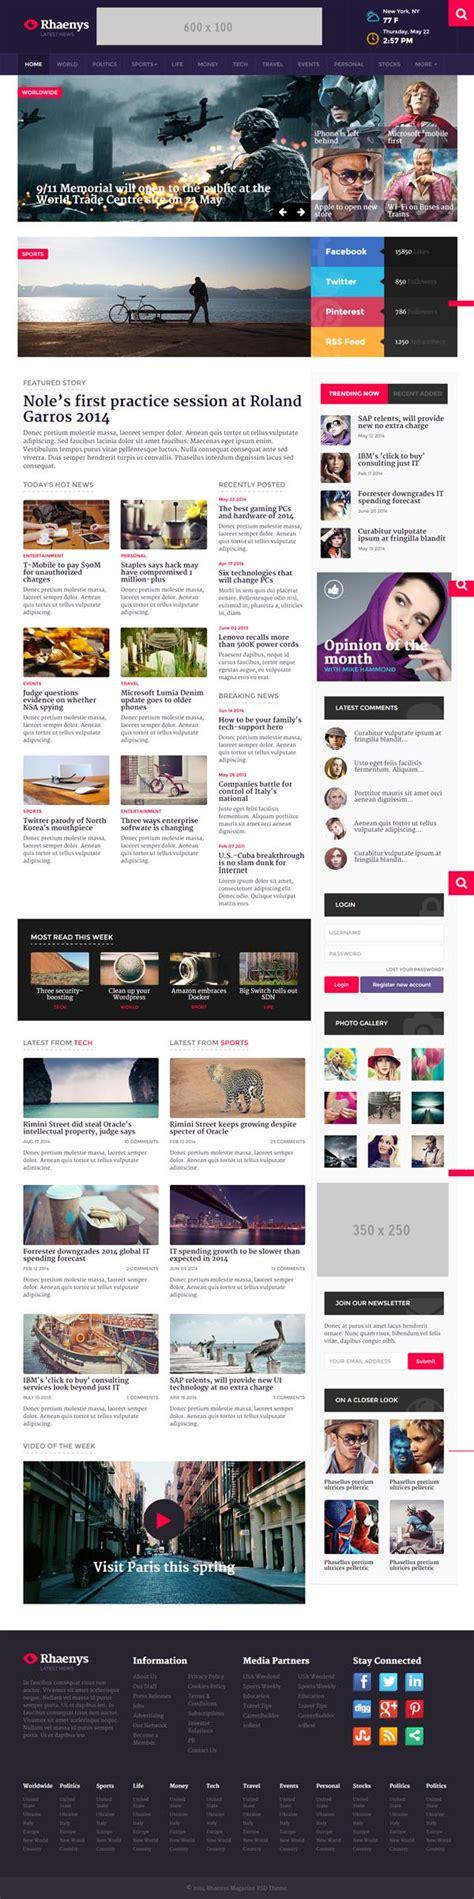 html5 templates for news website best responsive html5 website templates html5 css3